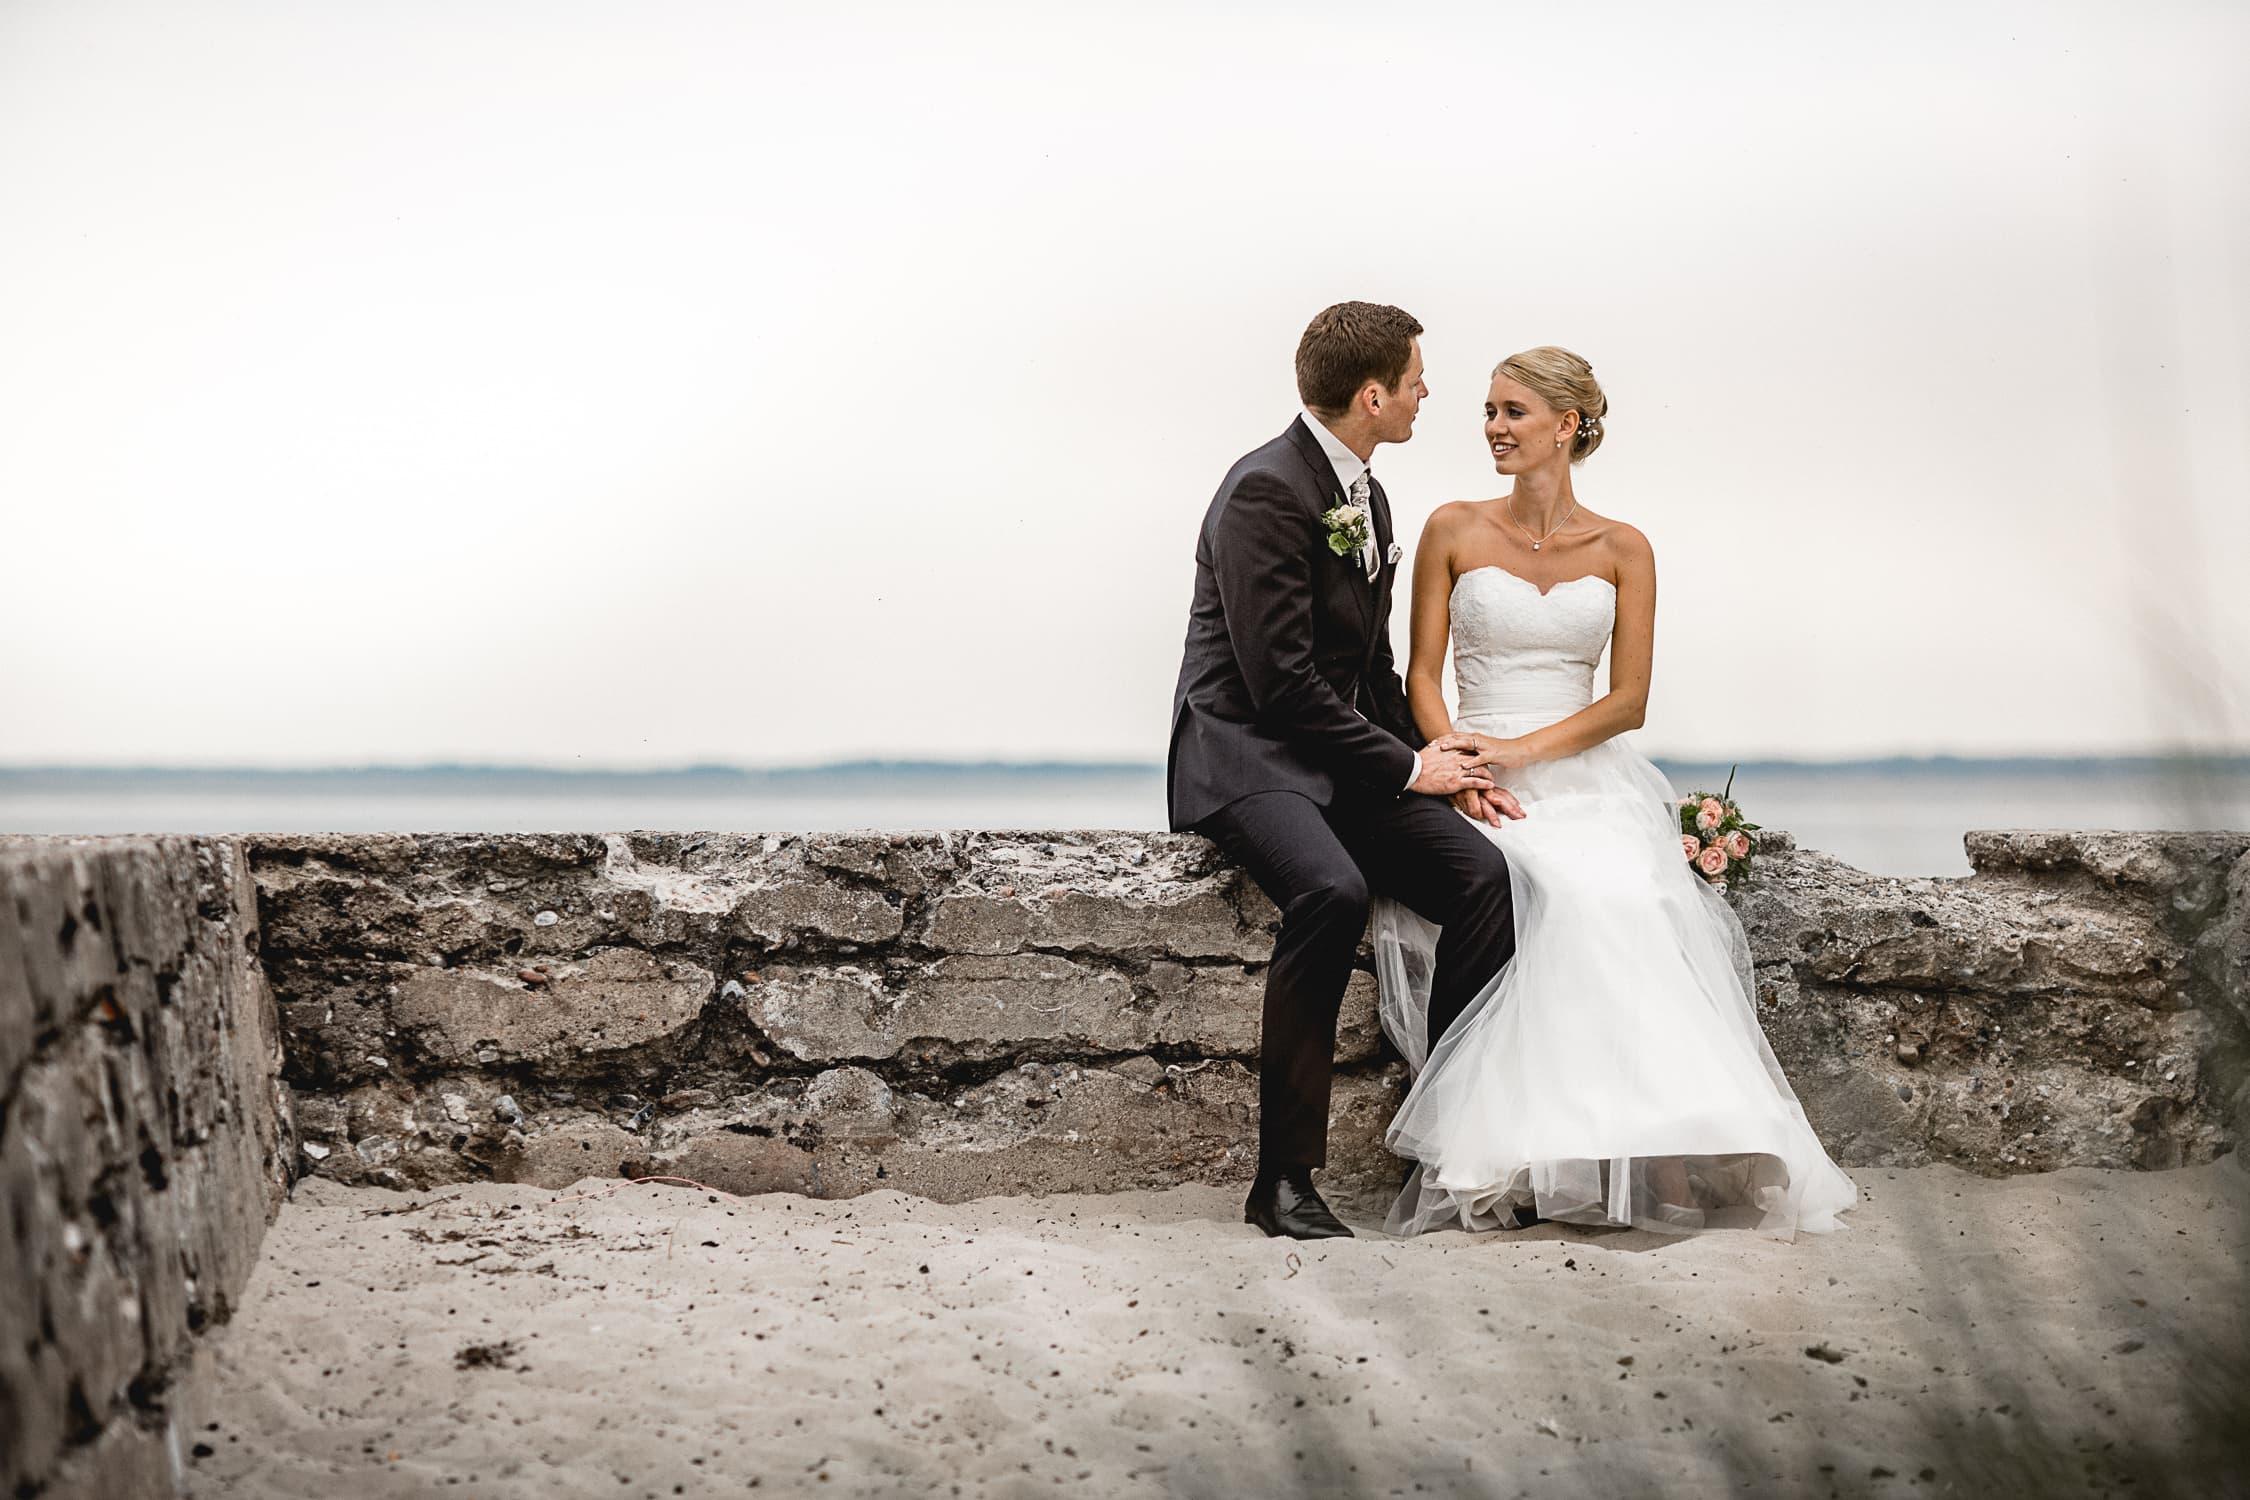 Karoline und Thomas, Hochzeitsfotograf, www.studioamkanal.de,